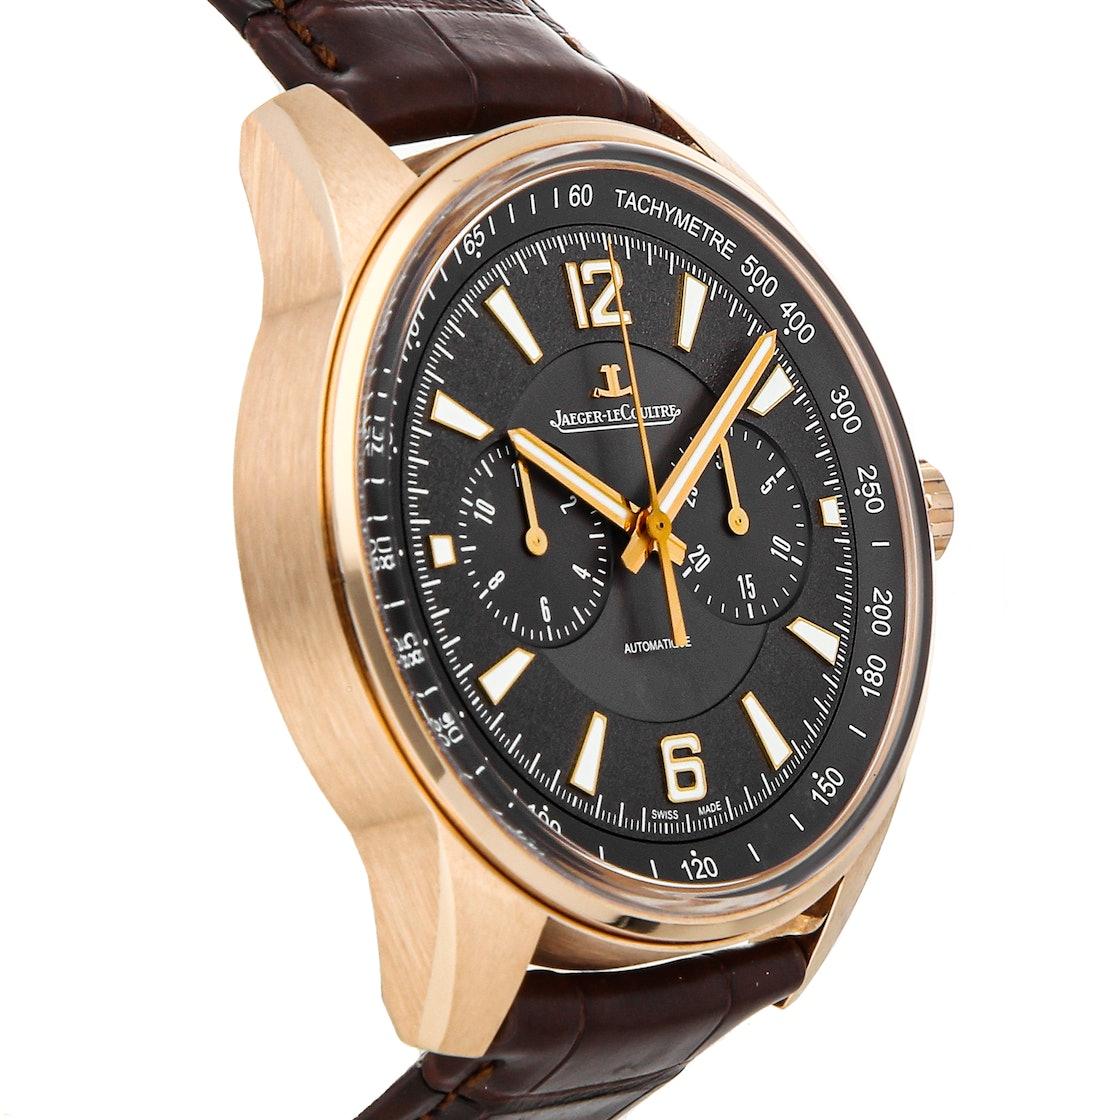 Jaeger-LeCoultre Polaris Chronograph Q9022450